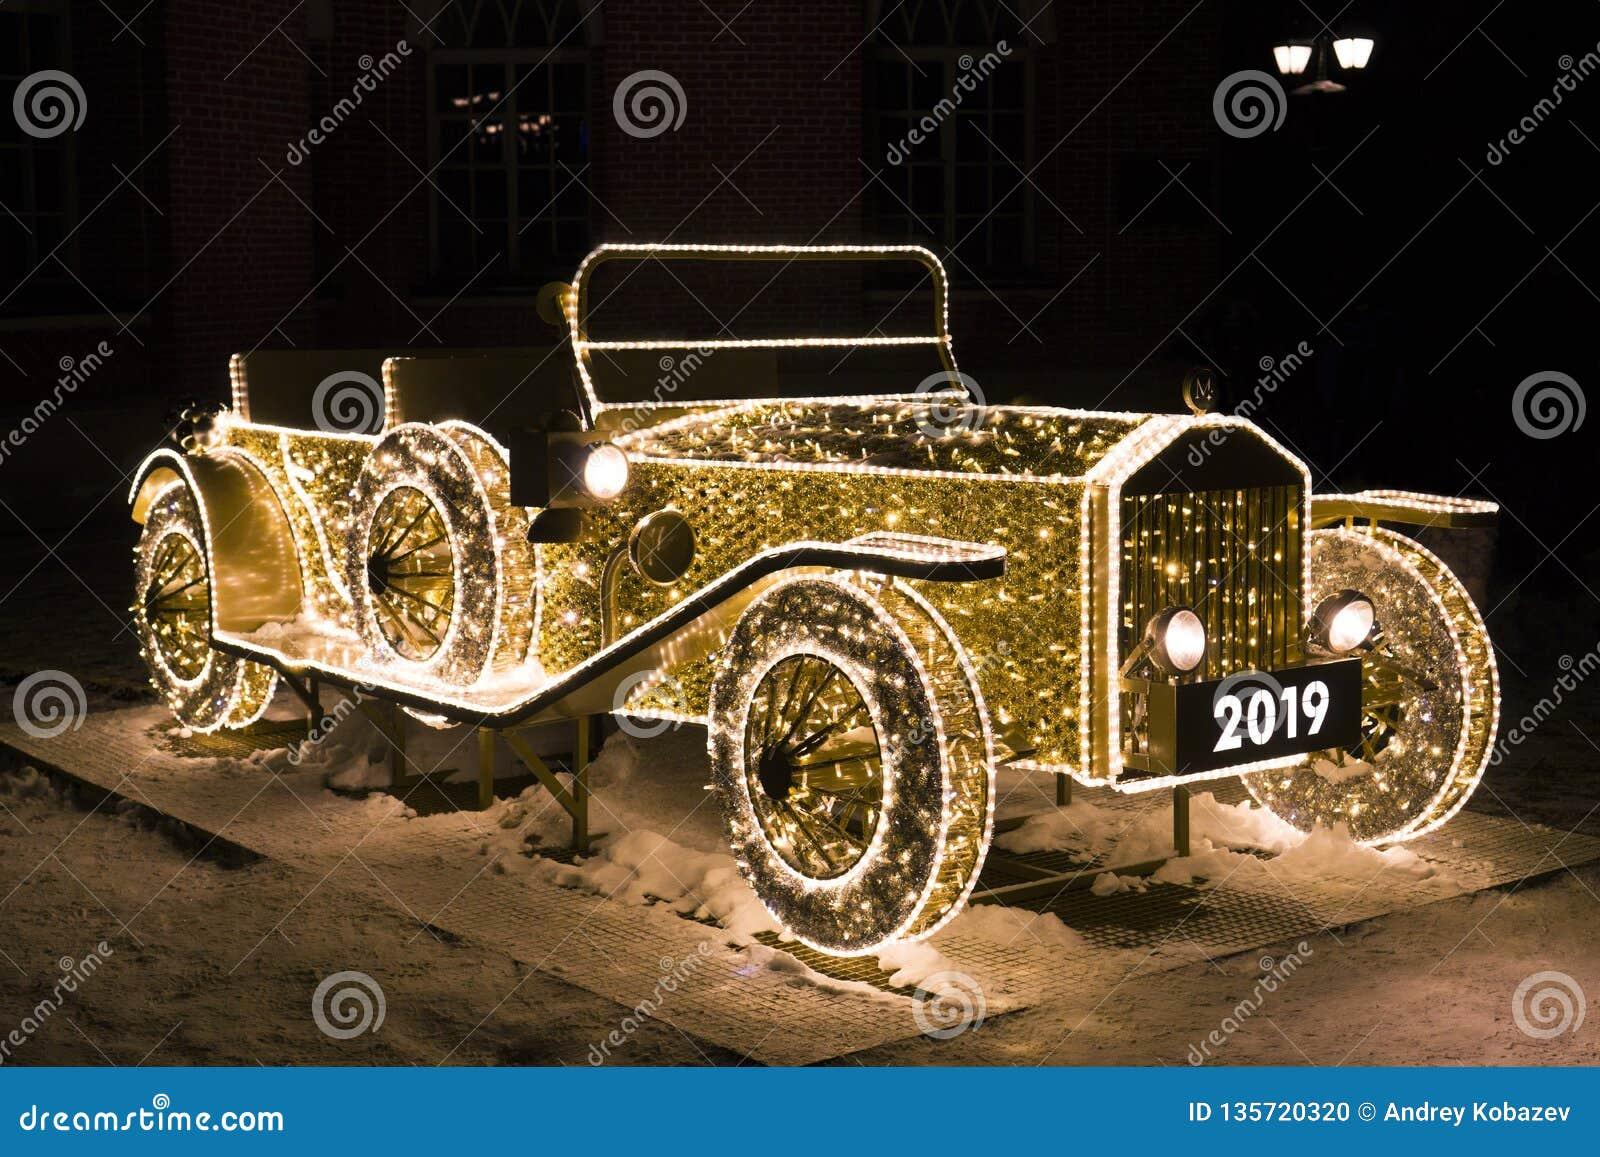 Vintage car of glowing Christmas lights